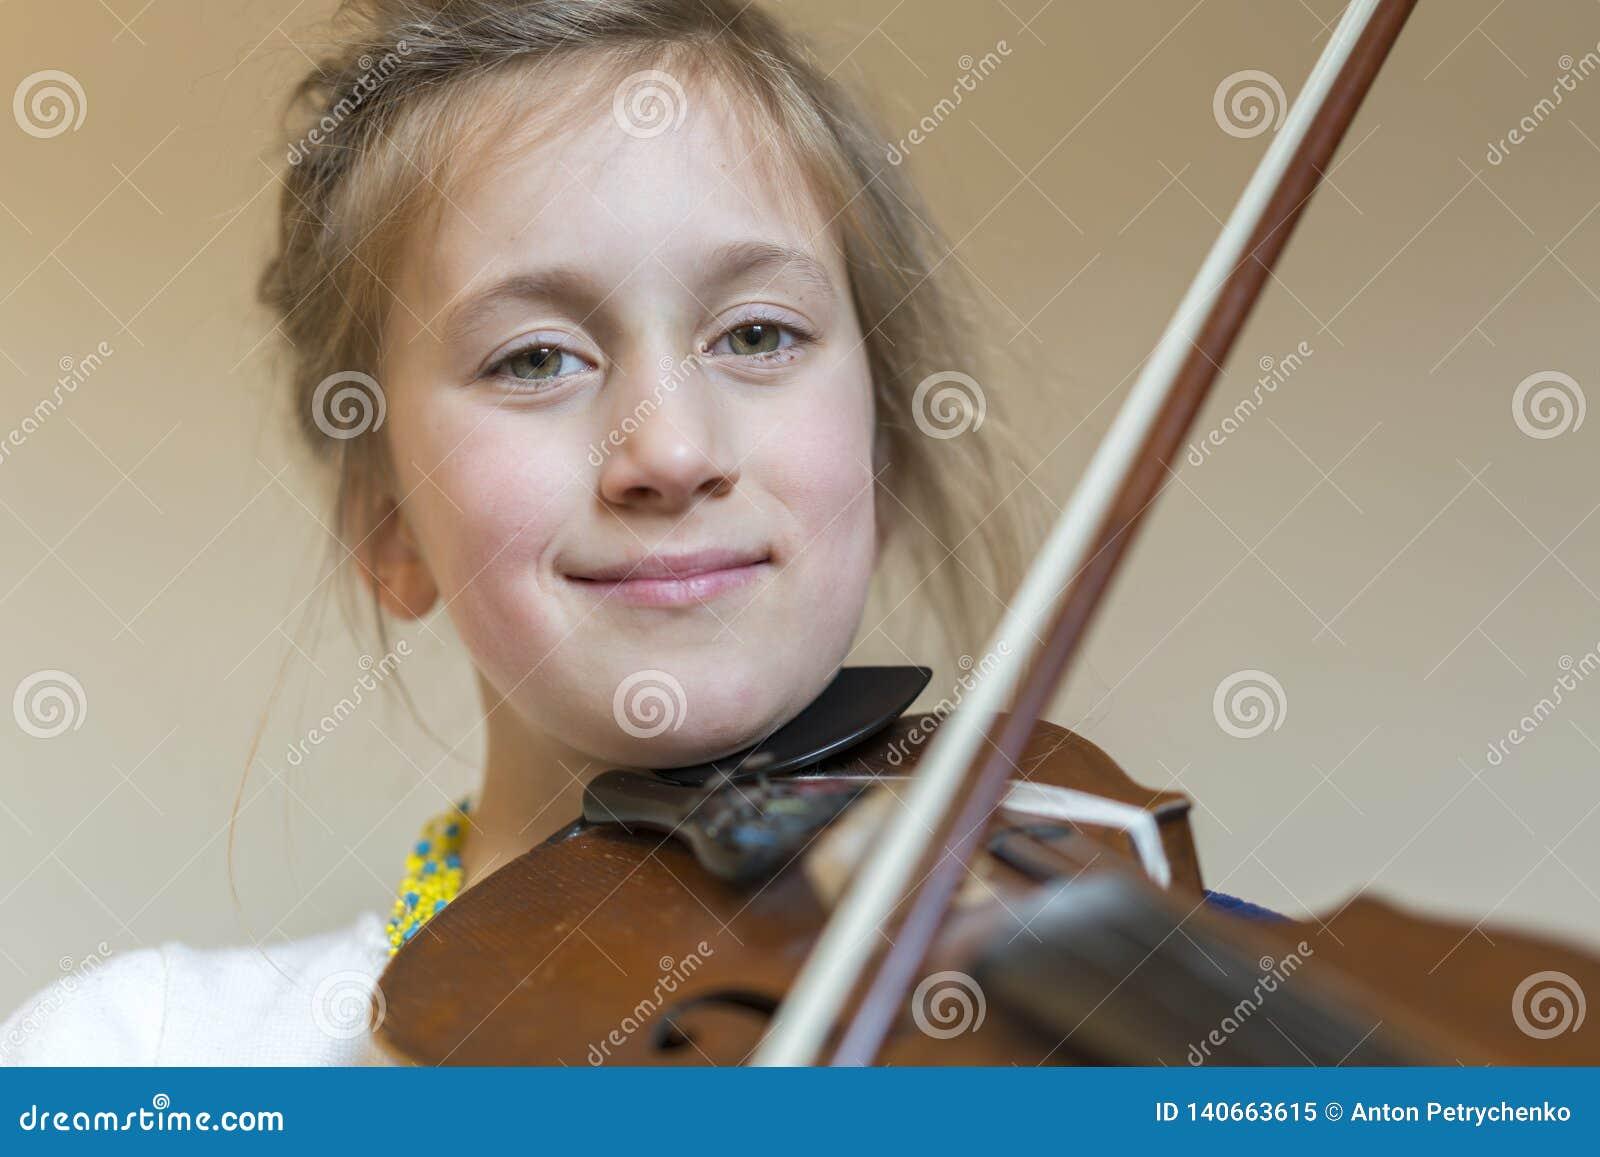 Cute Little Girl In A Beautiful Dress Playing Violin  Joyful